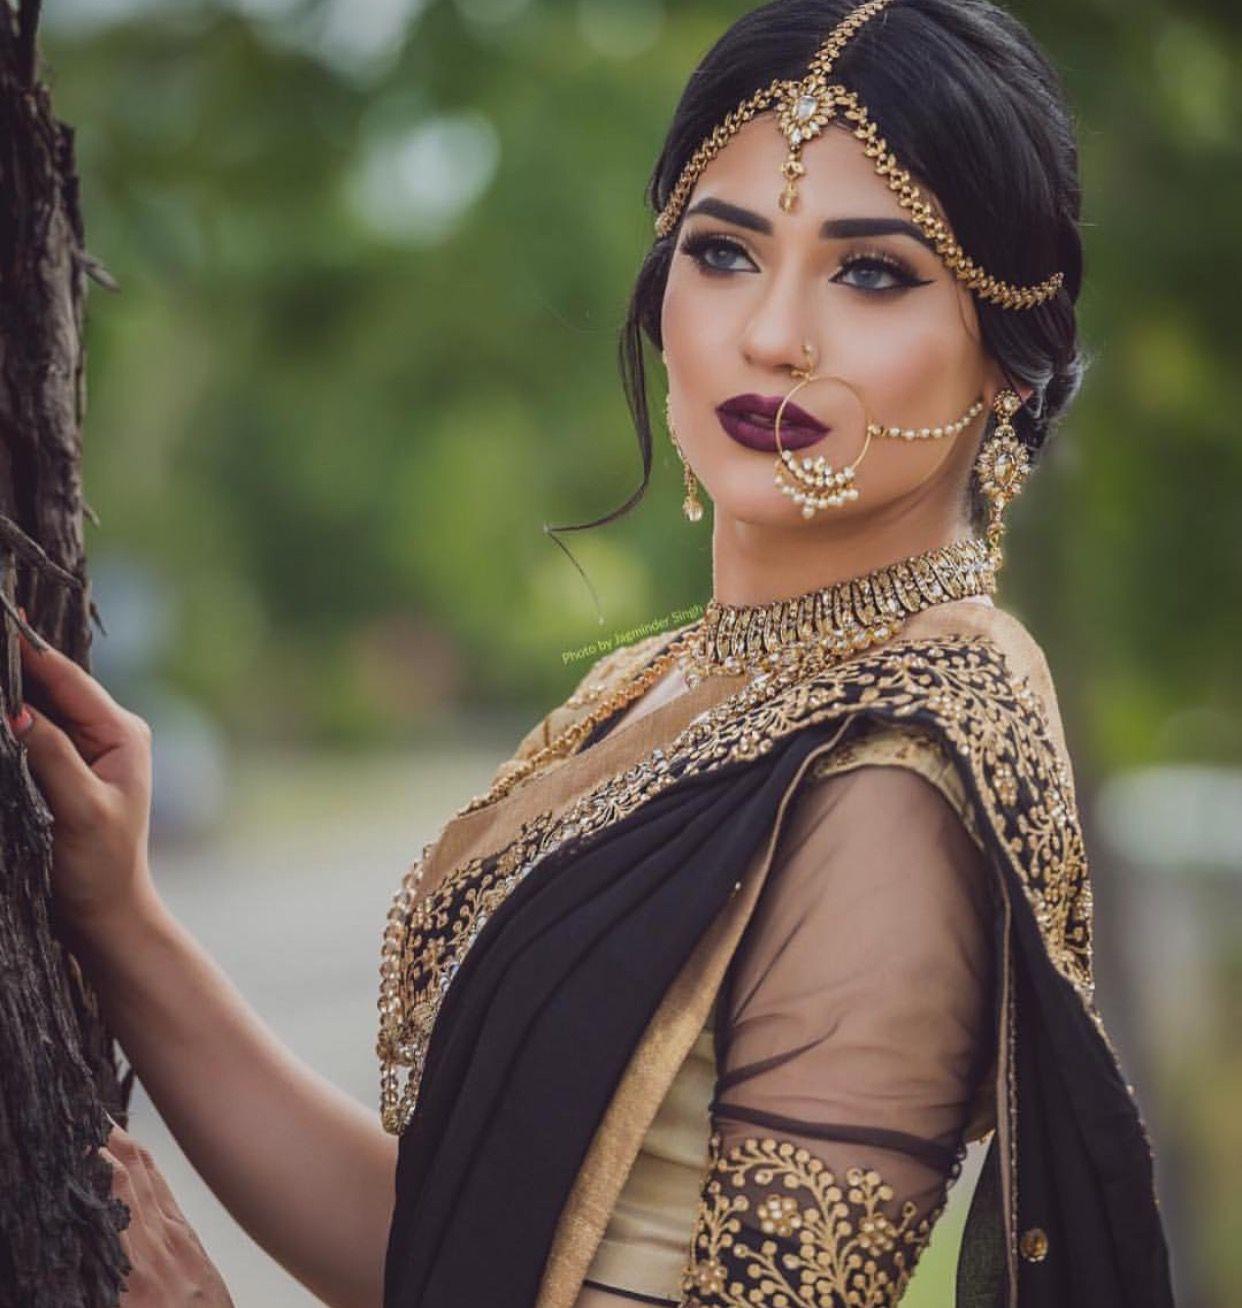 Stunning! browngirl Magazine Insta browngirlmag